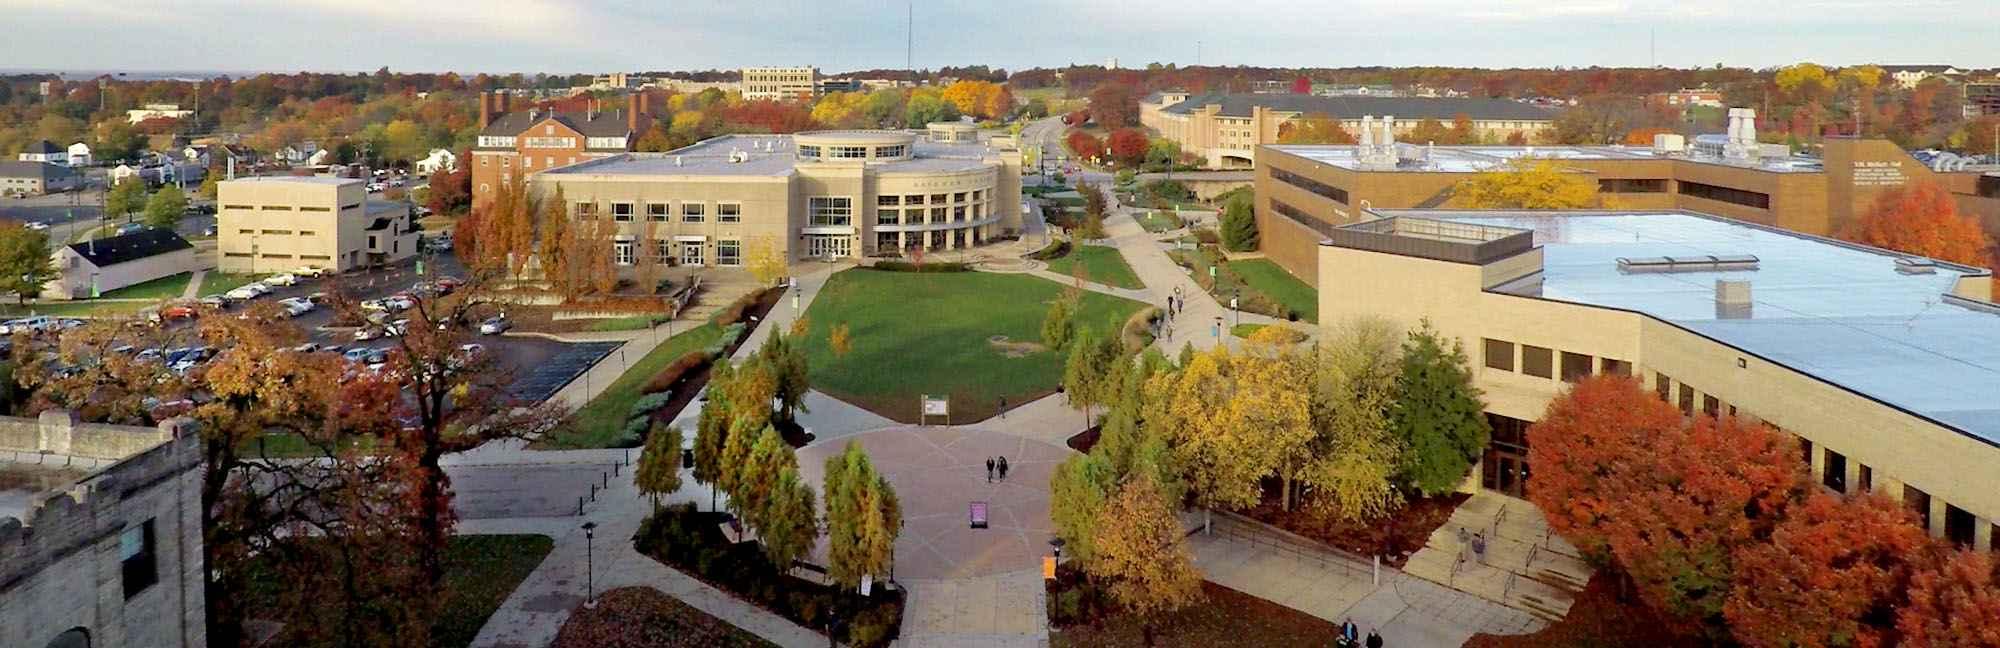 Missouri University of Science & Technology - Niche